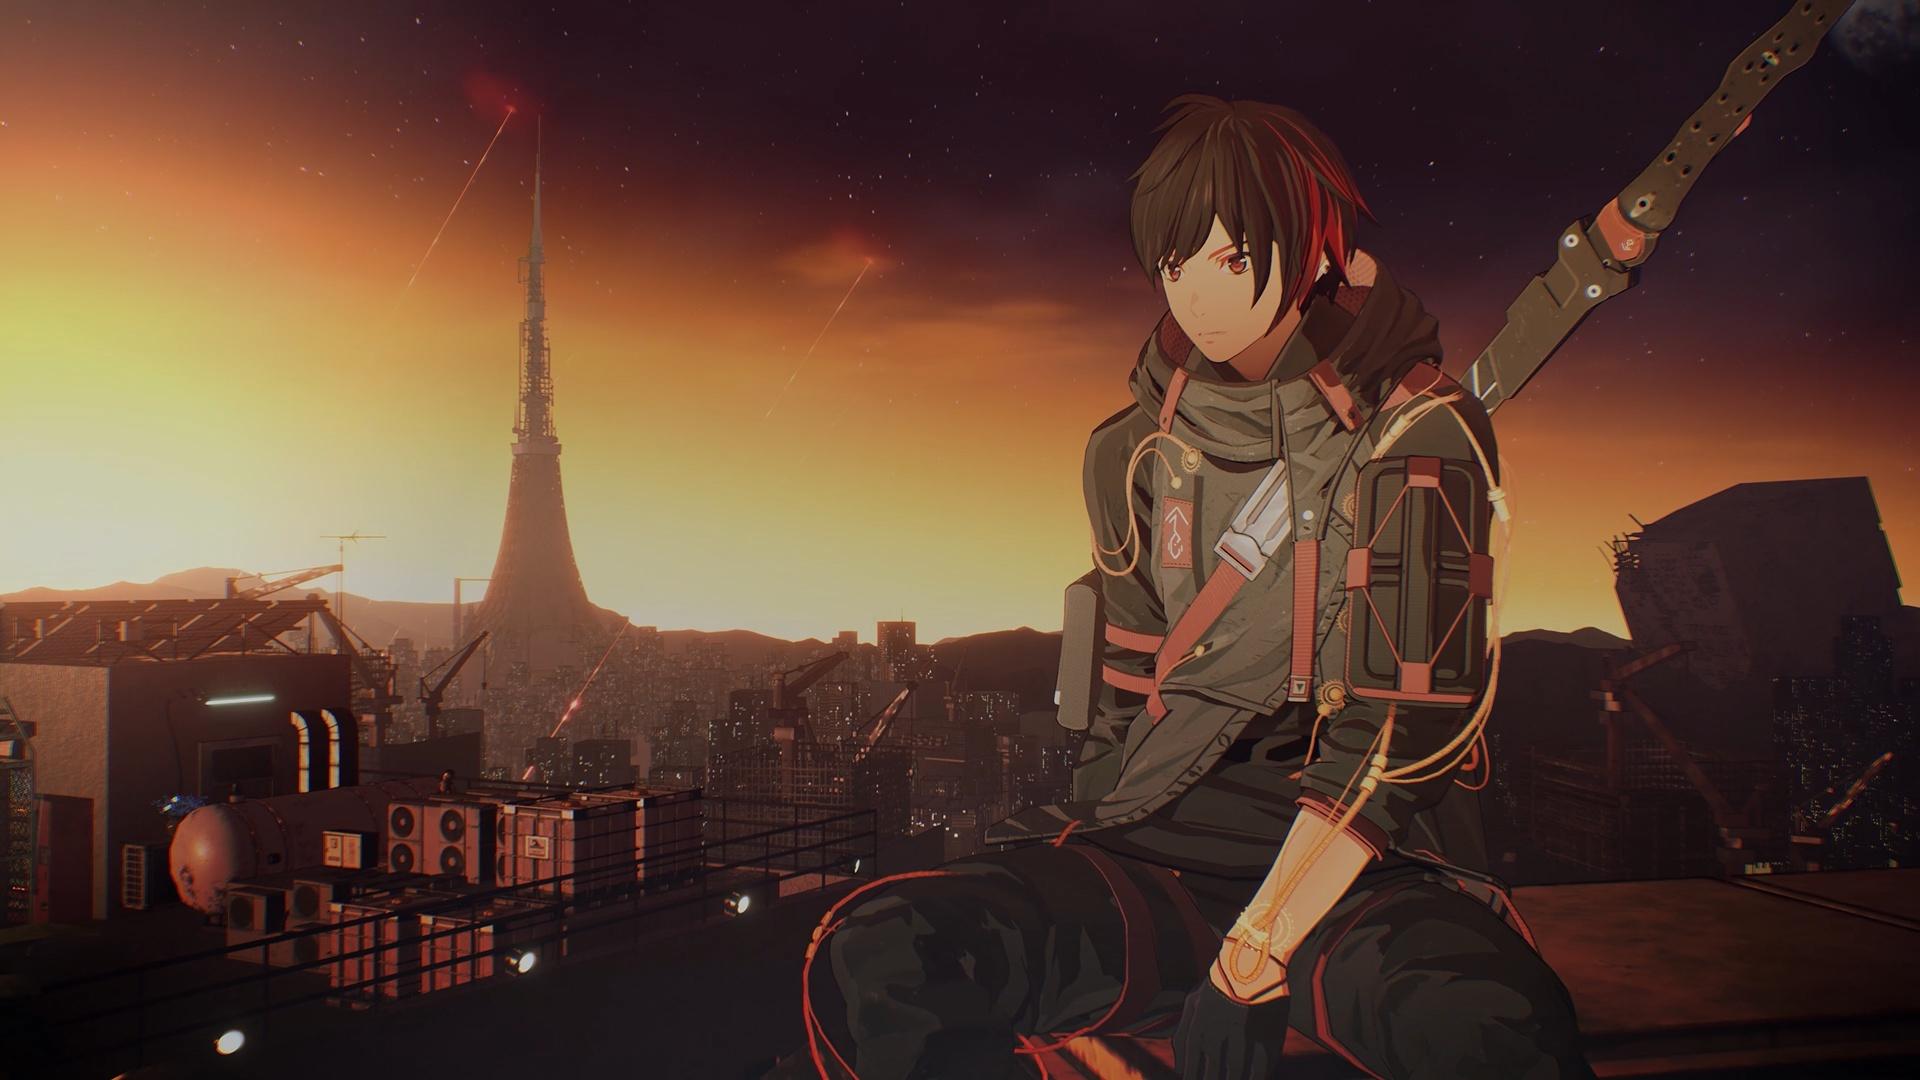 Scarlet Nexus hd background